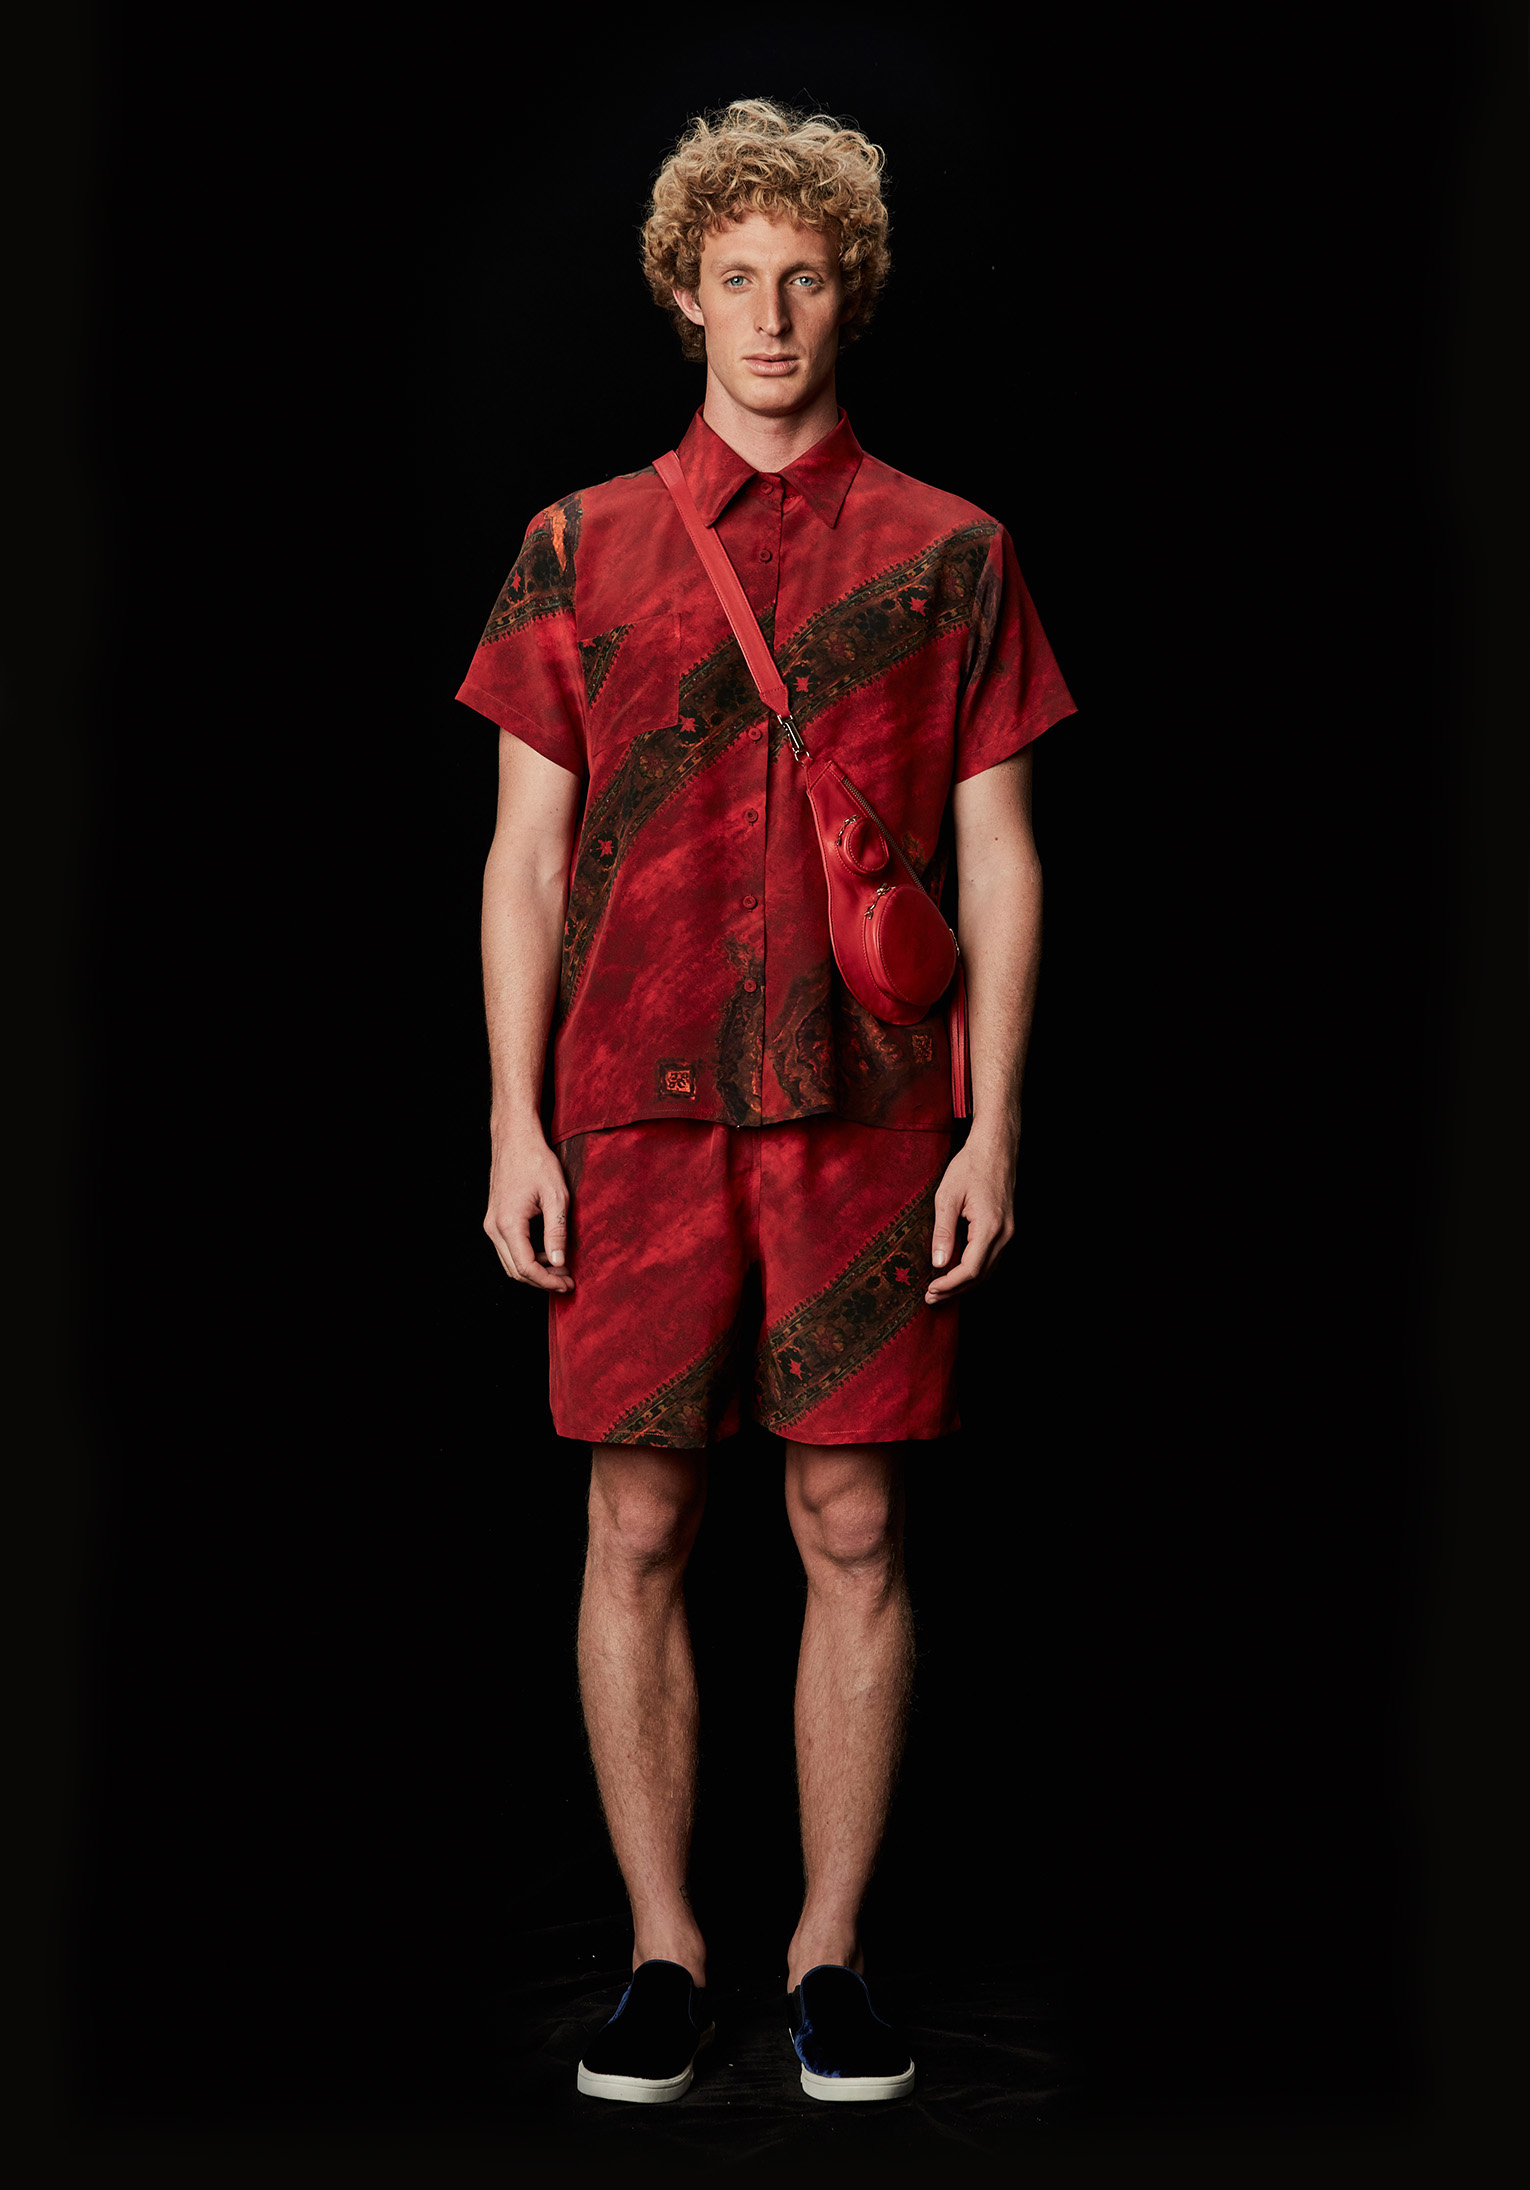 camisa alibaba.jpg